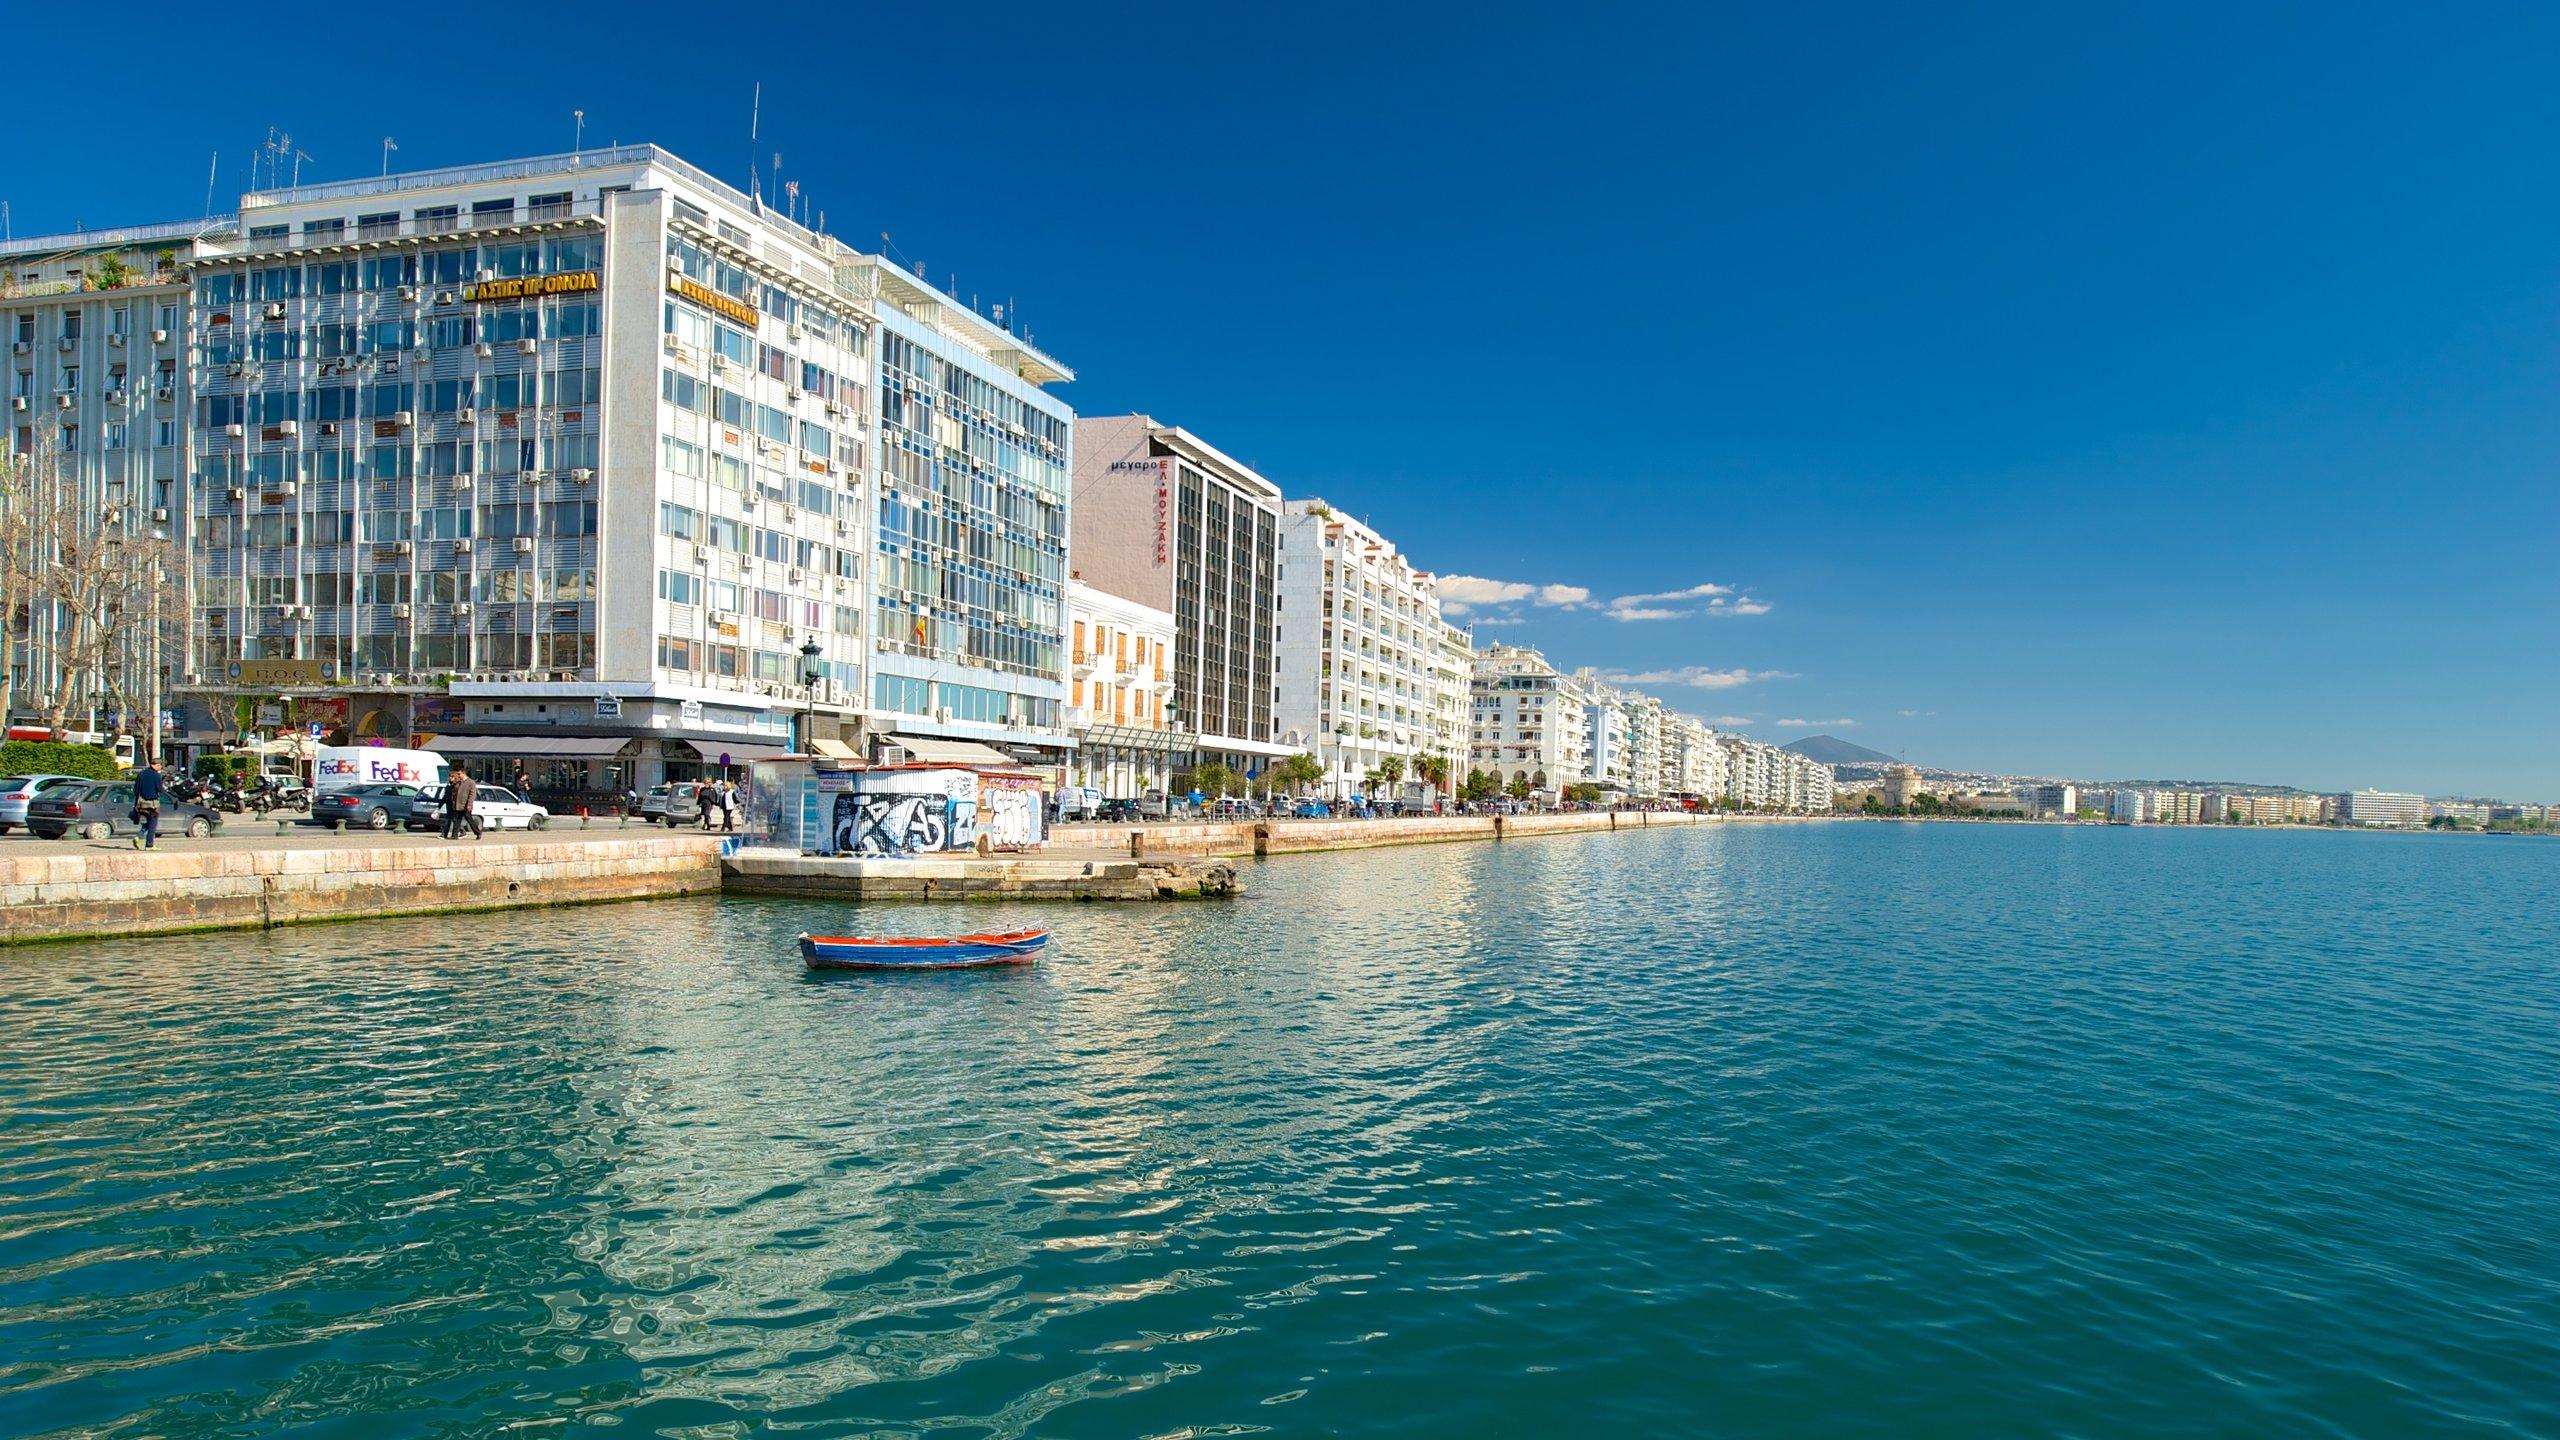 Thessaloniki, Central Macedonia, Greece